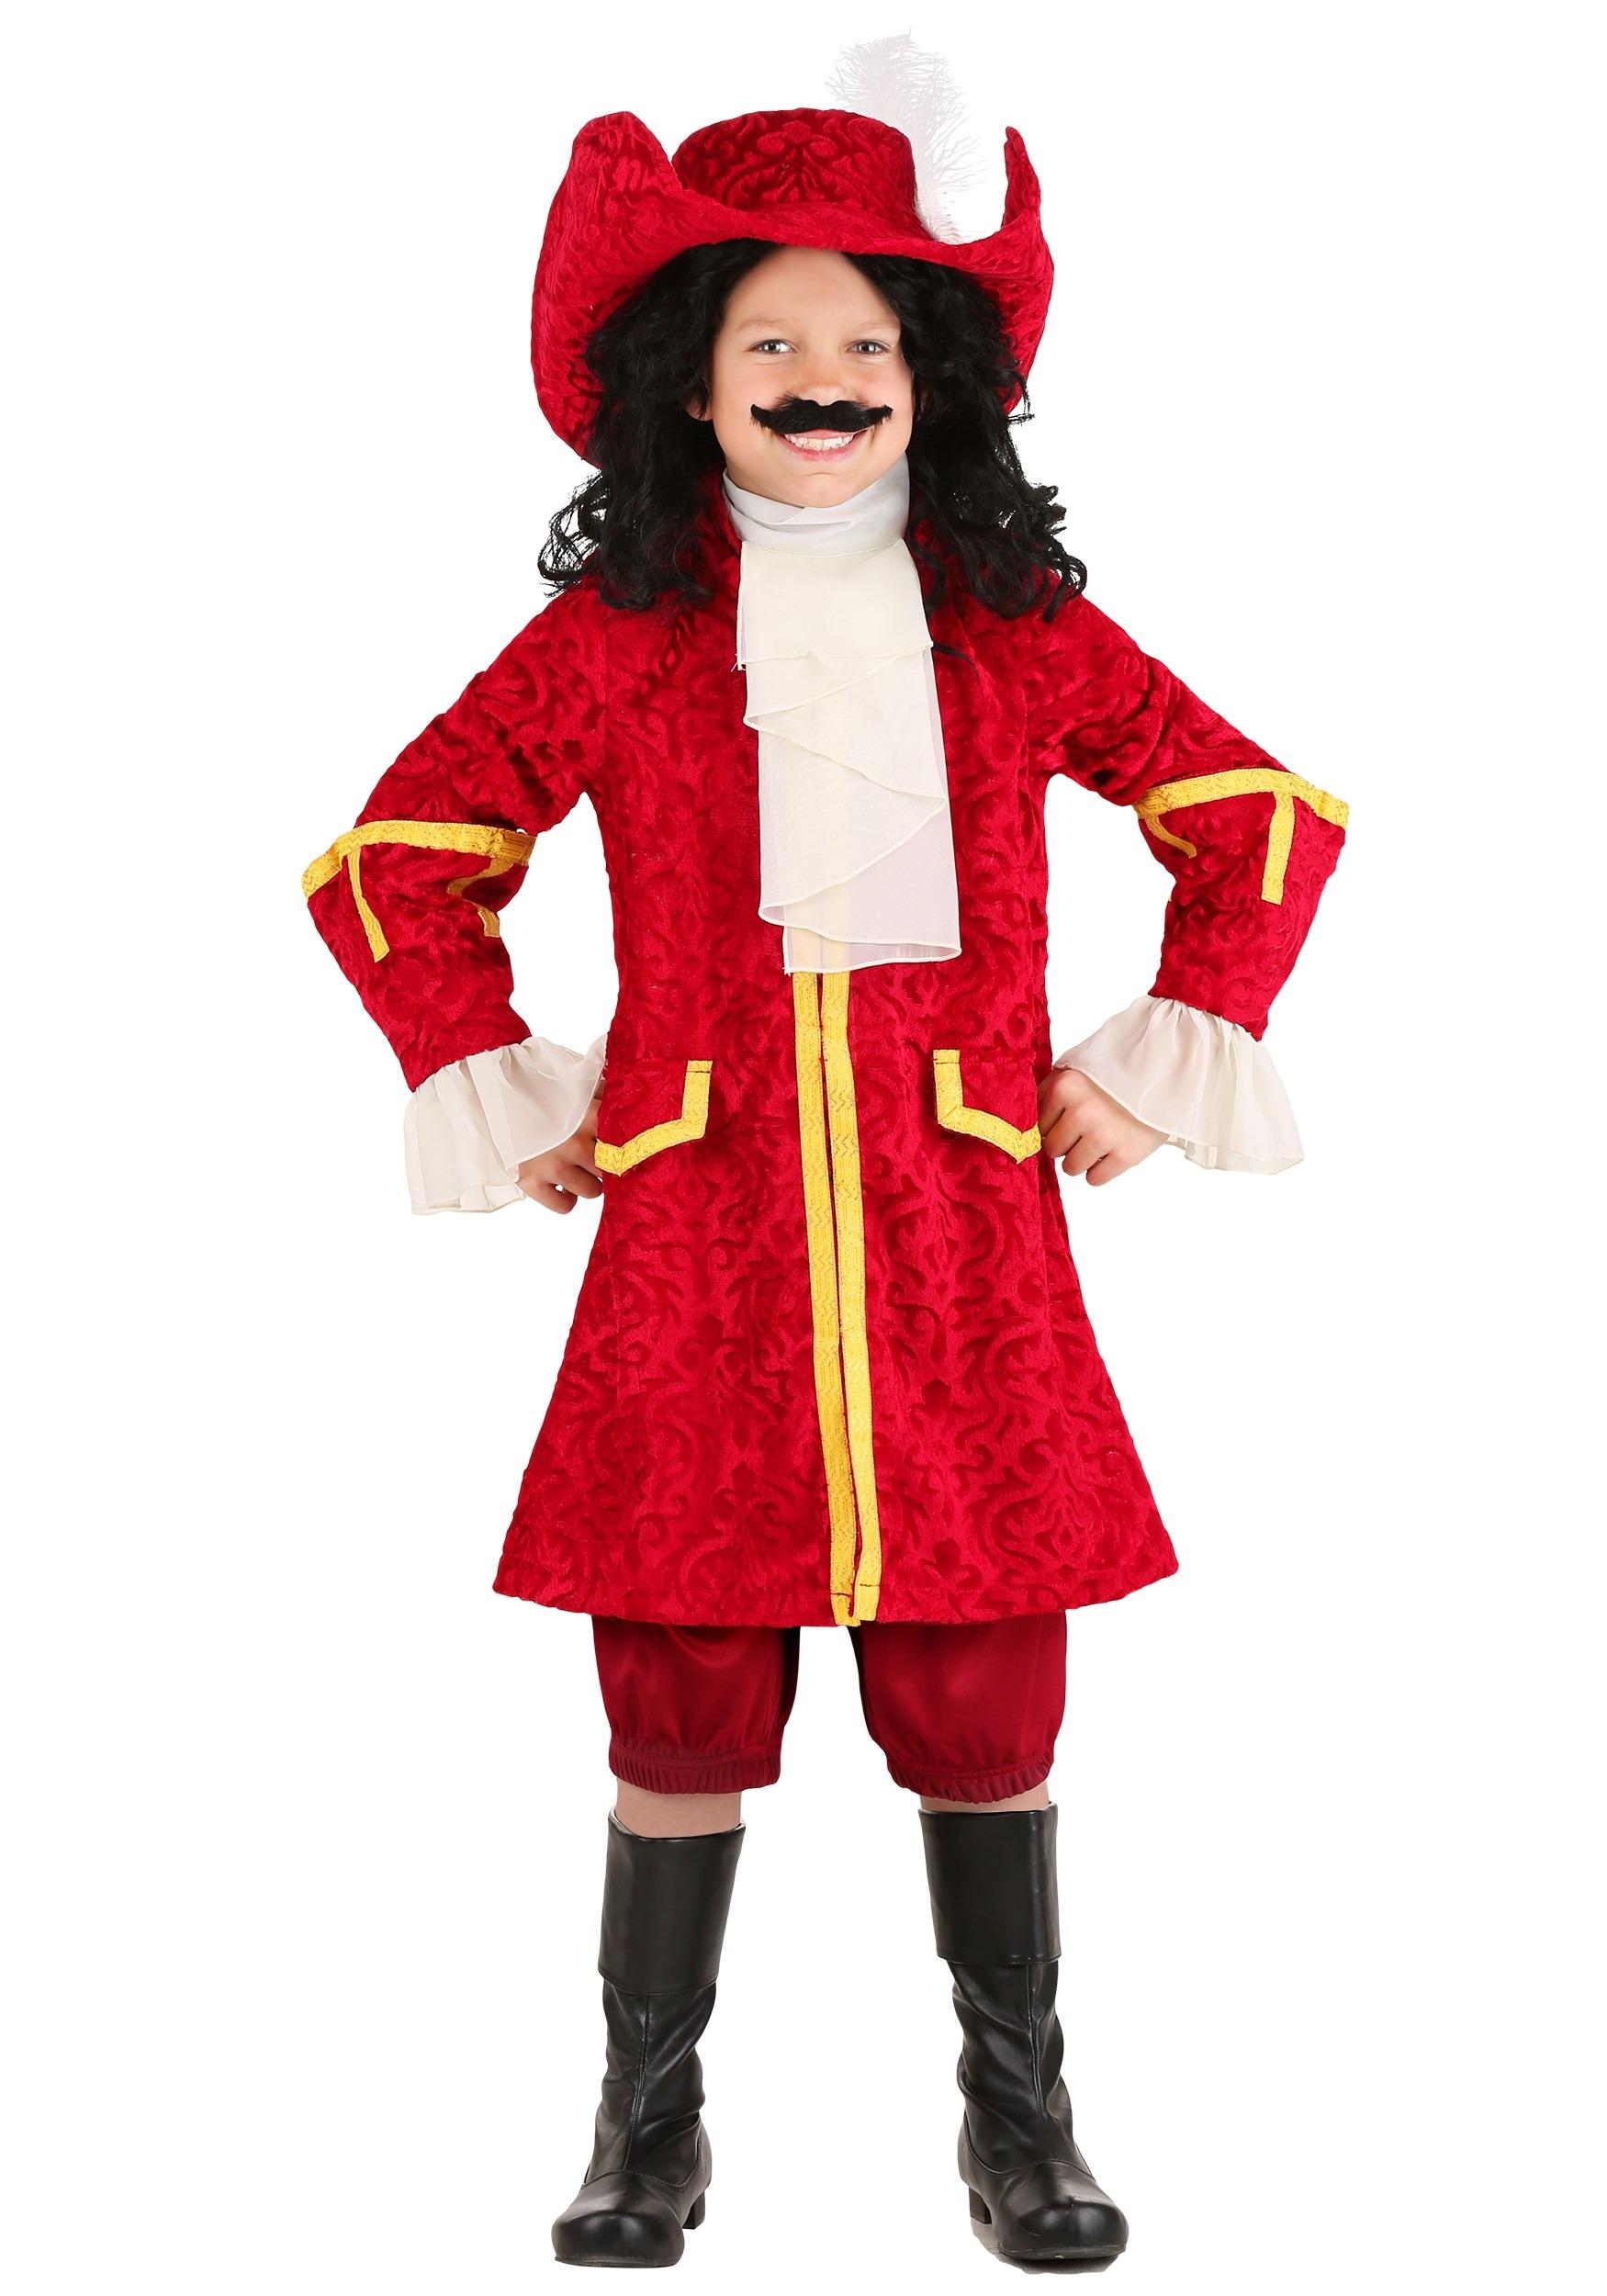 Captain Hook Kid's Costume